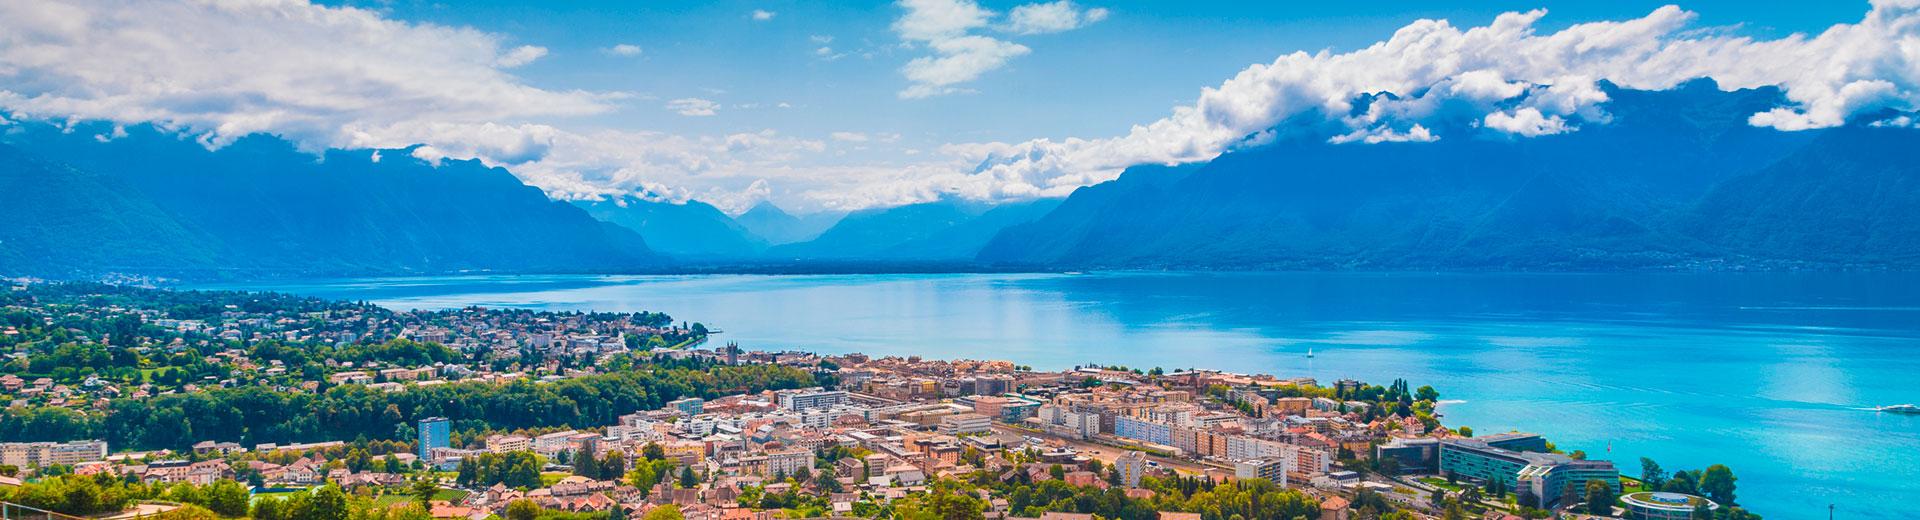 Pre-/Post Cruise tour Italy - Switzerland